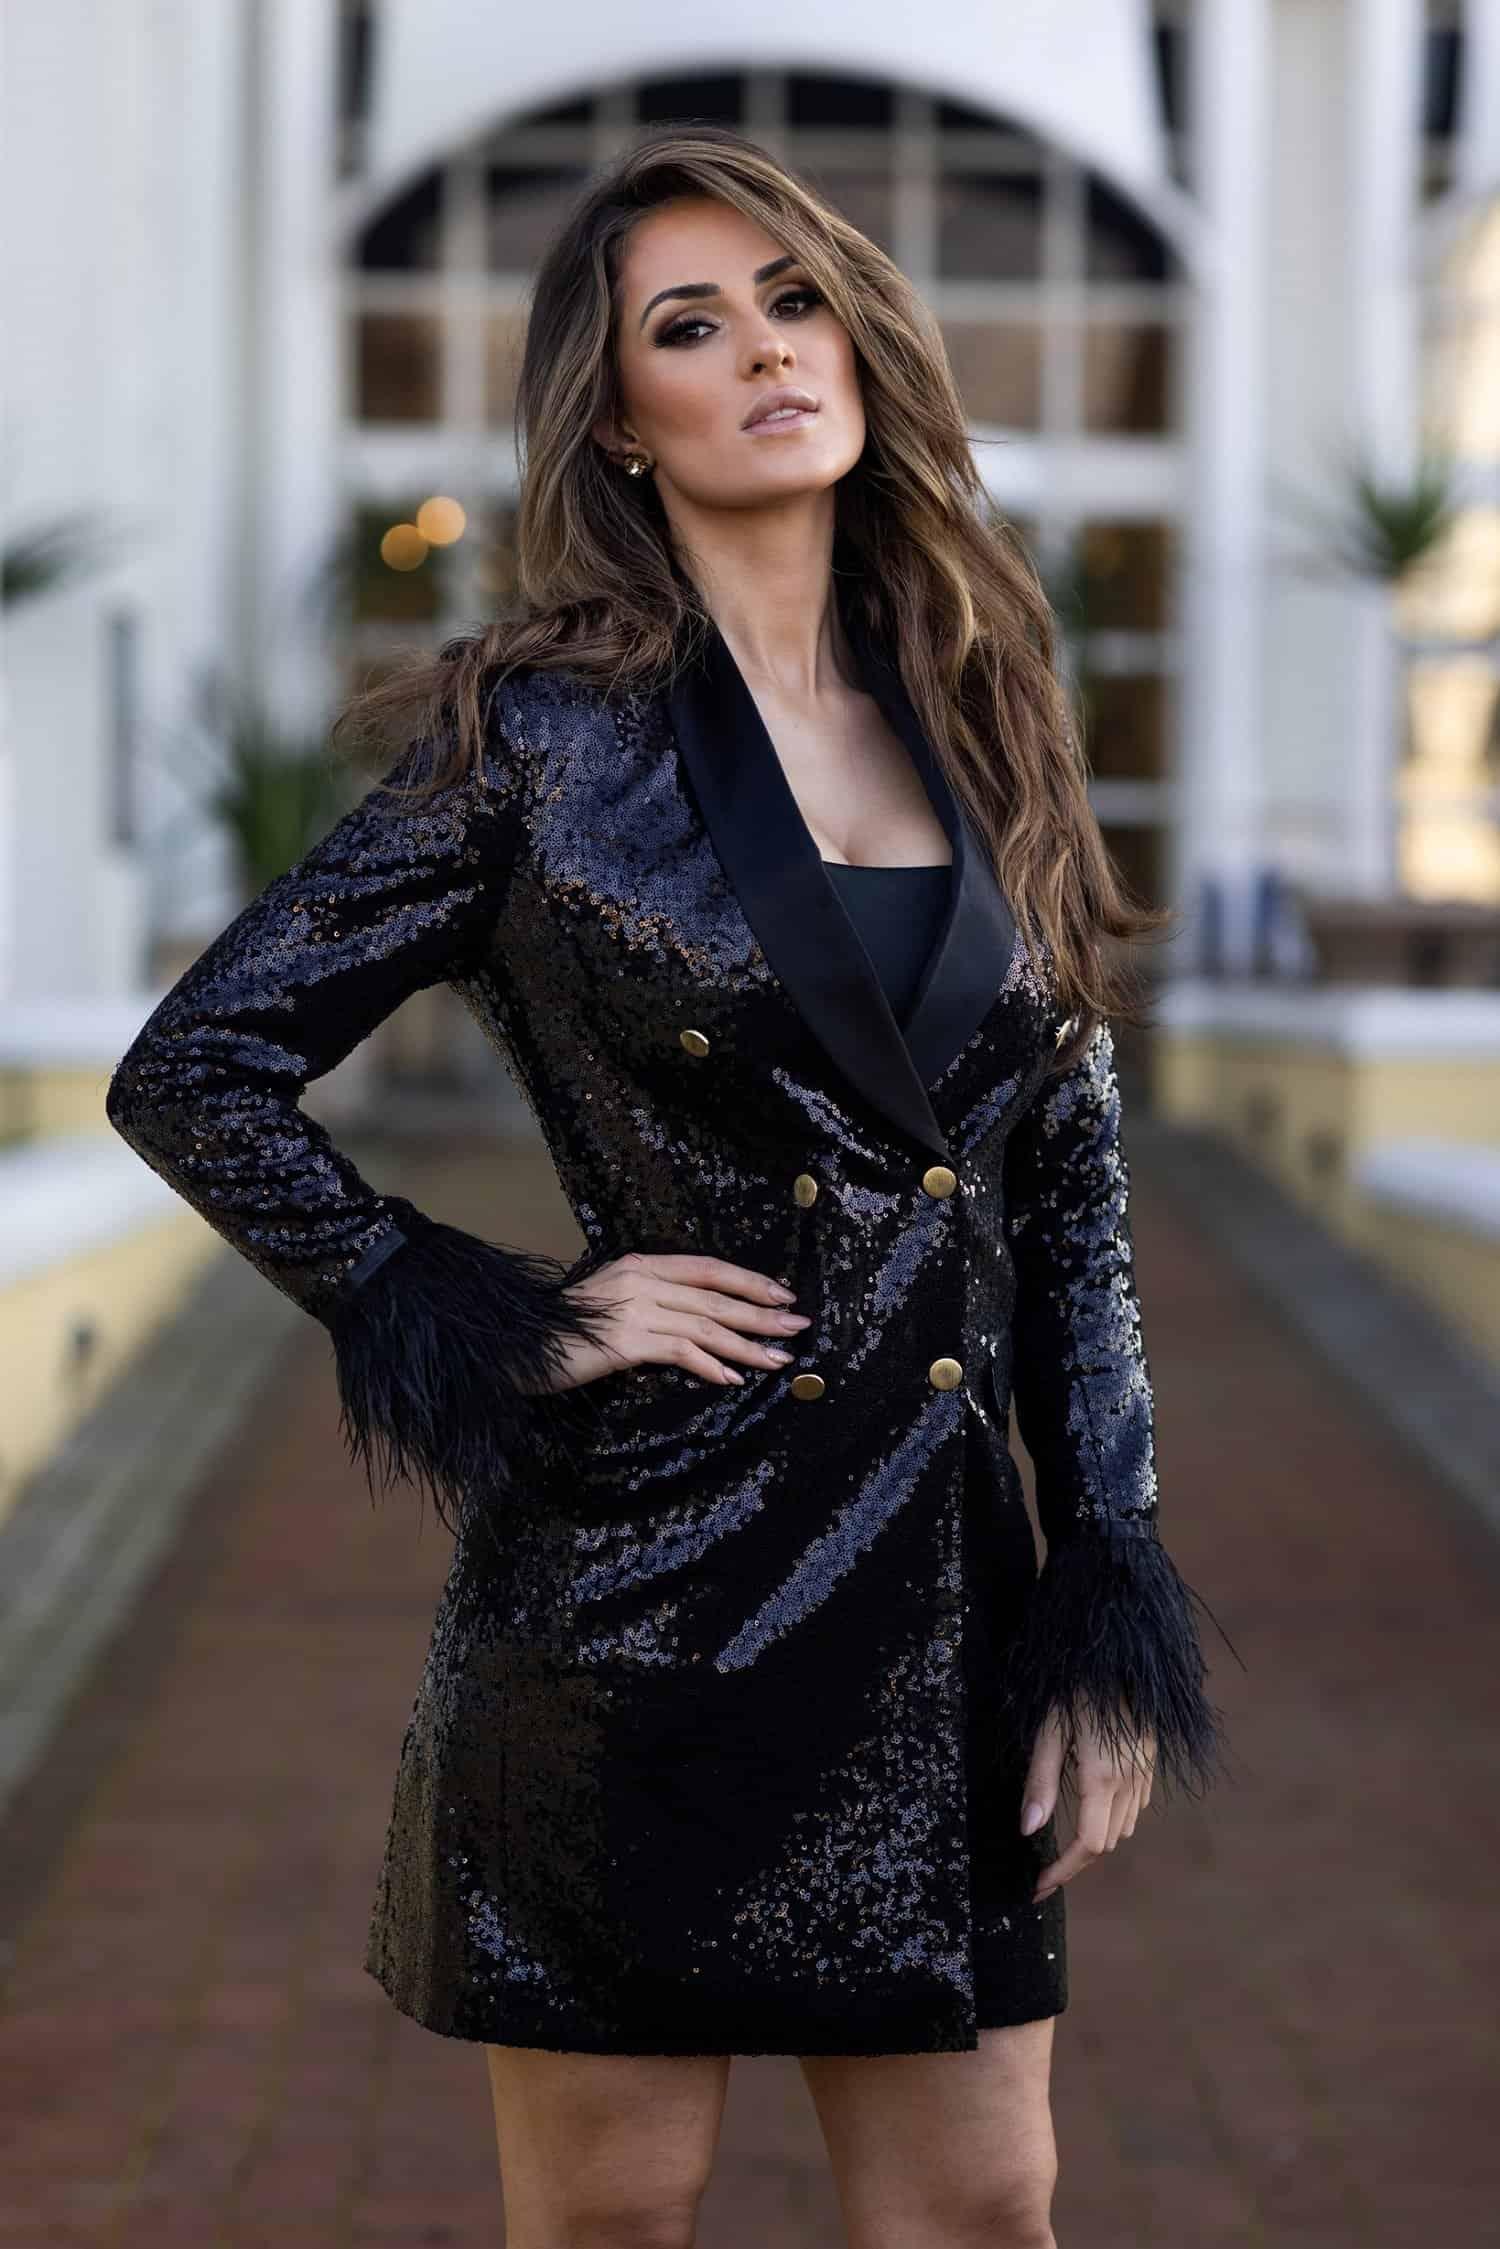 Bianca Bezuidenhout Miss SA top 10 2021 finalist. Picture: Supplied